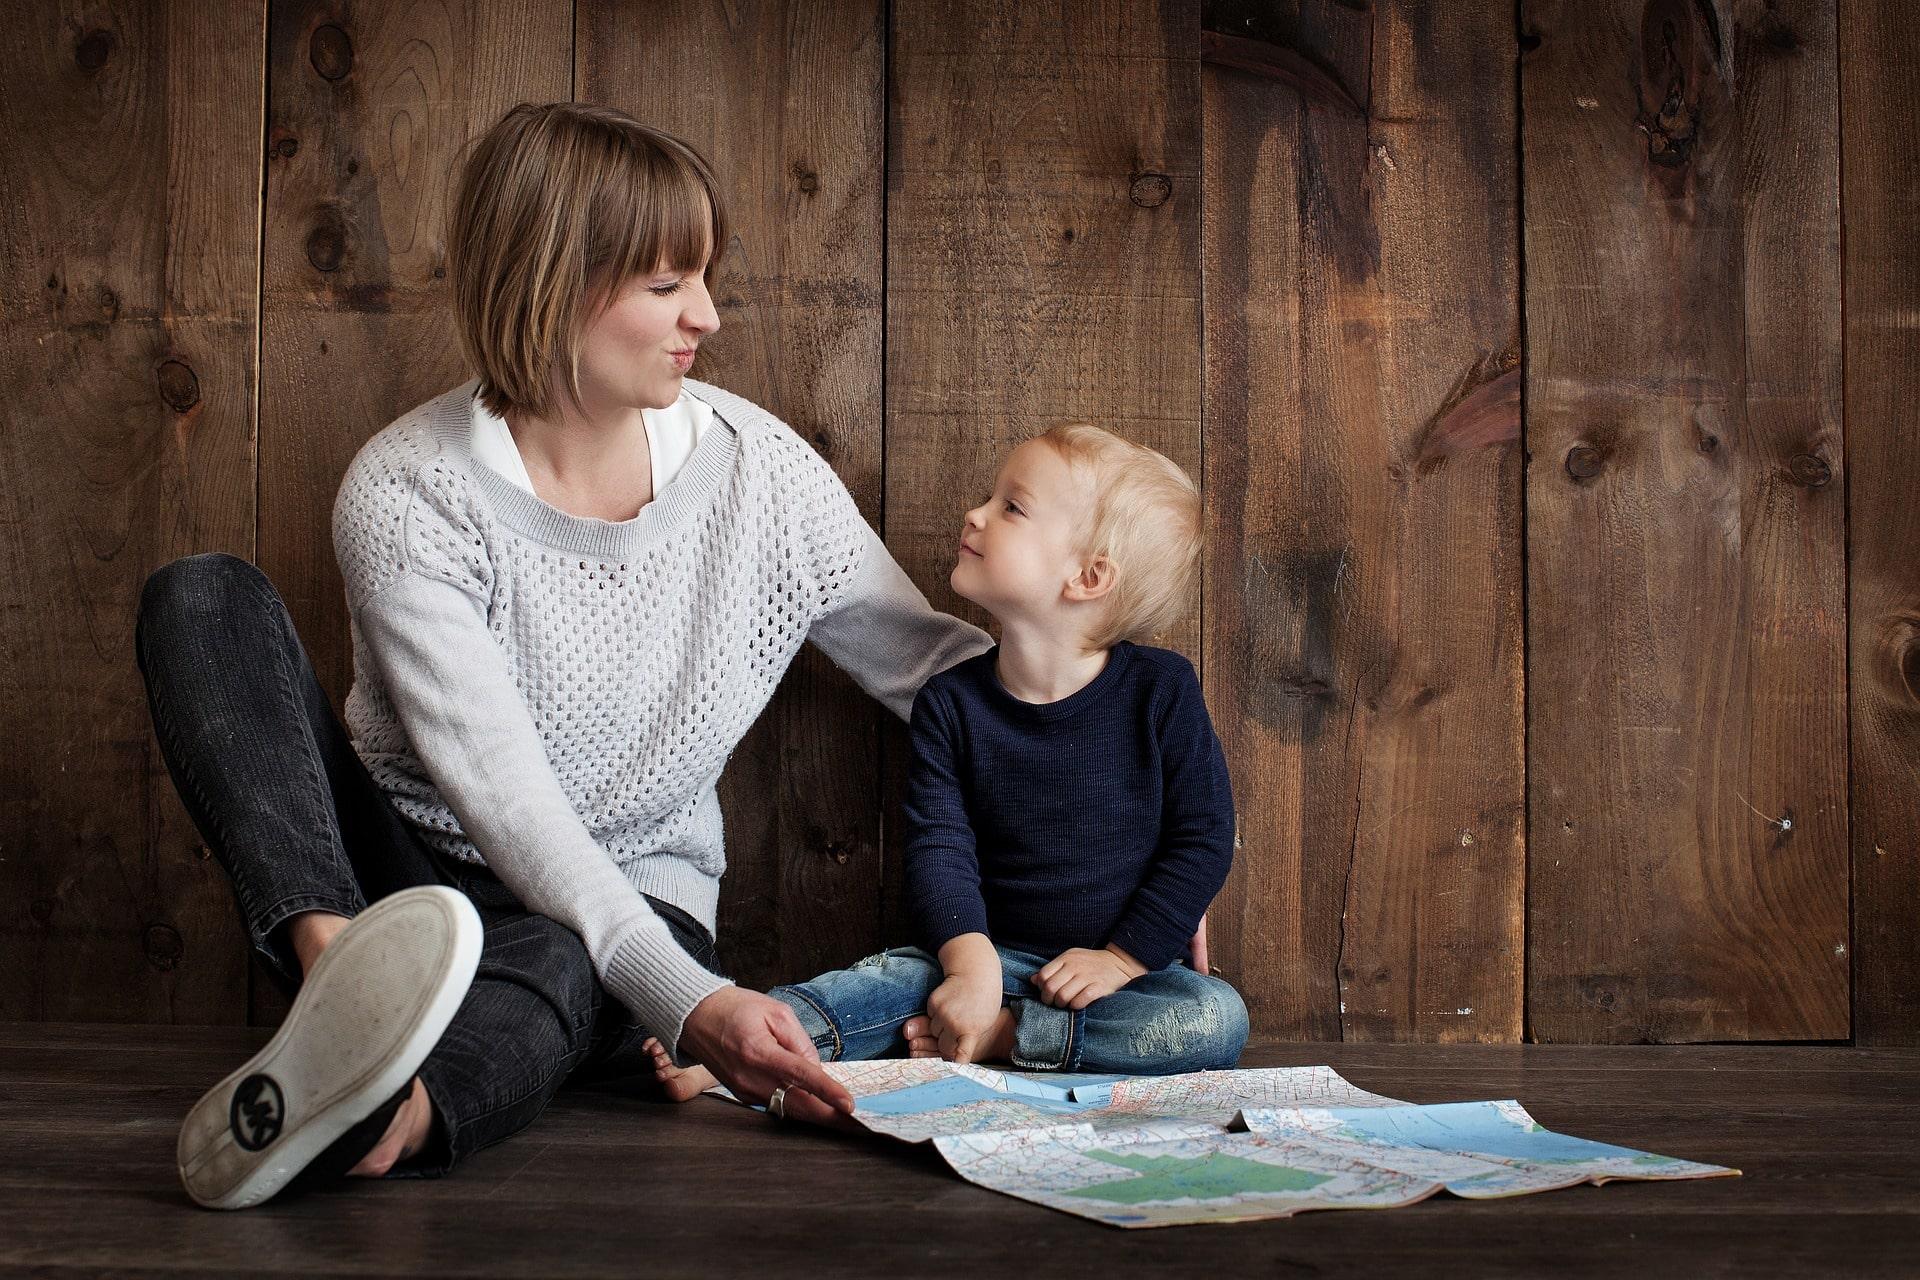 Мамочка и дитя